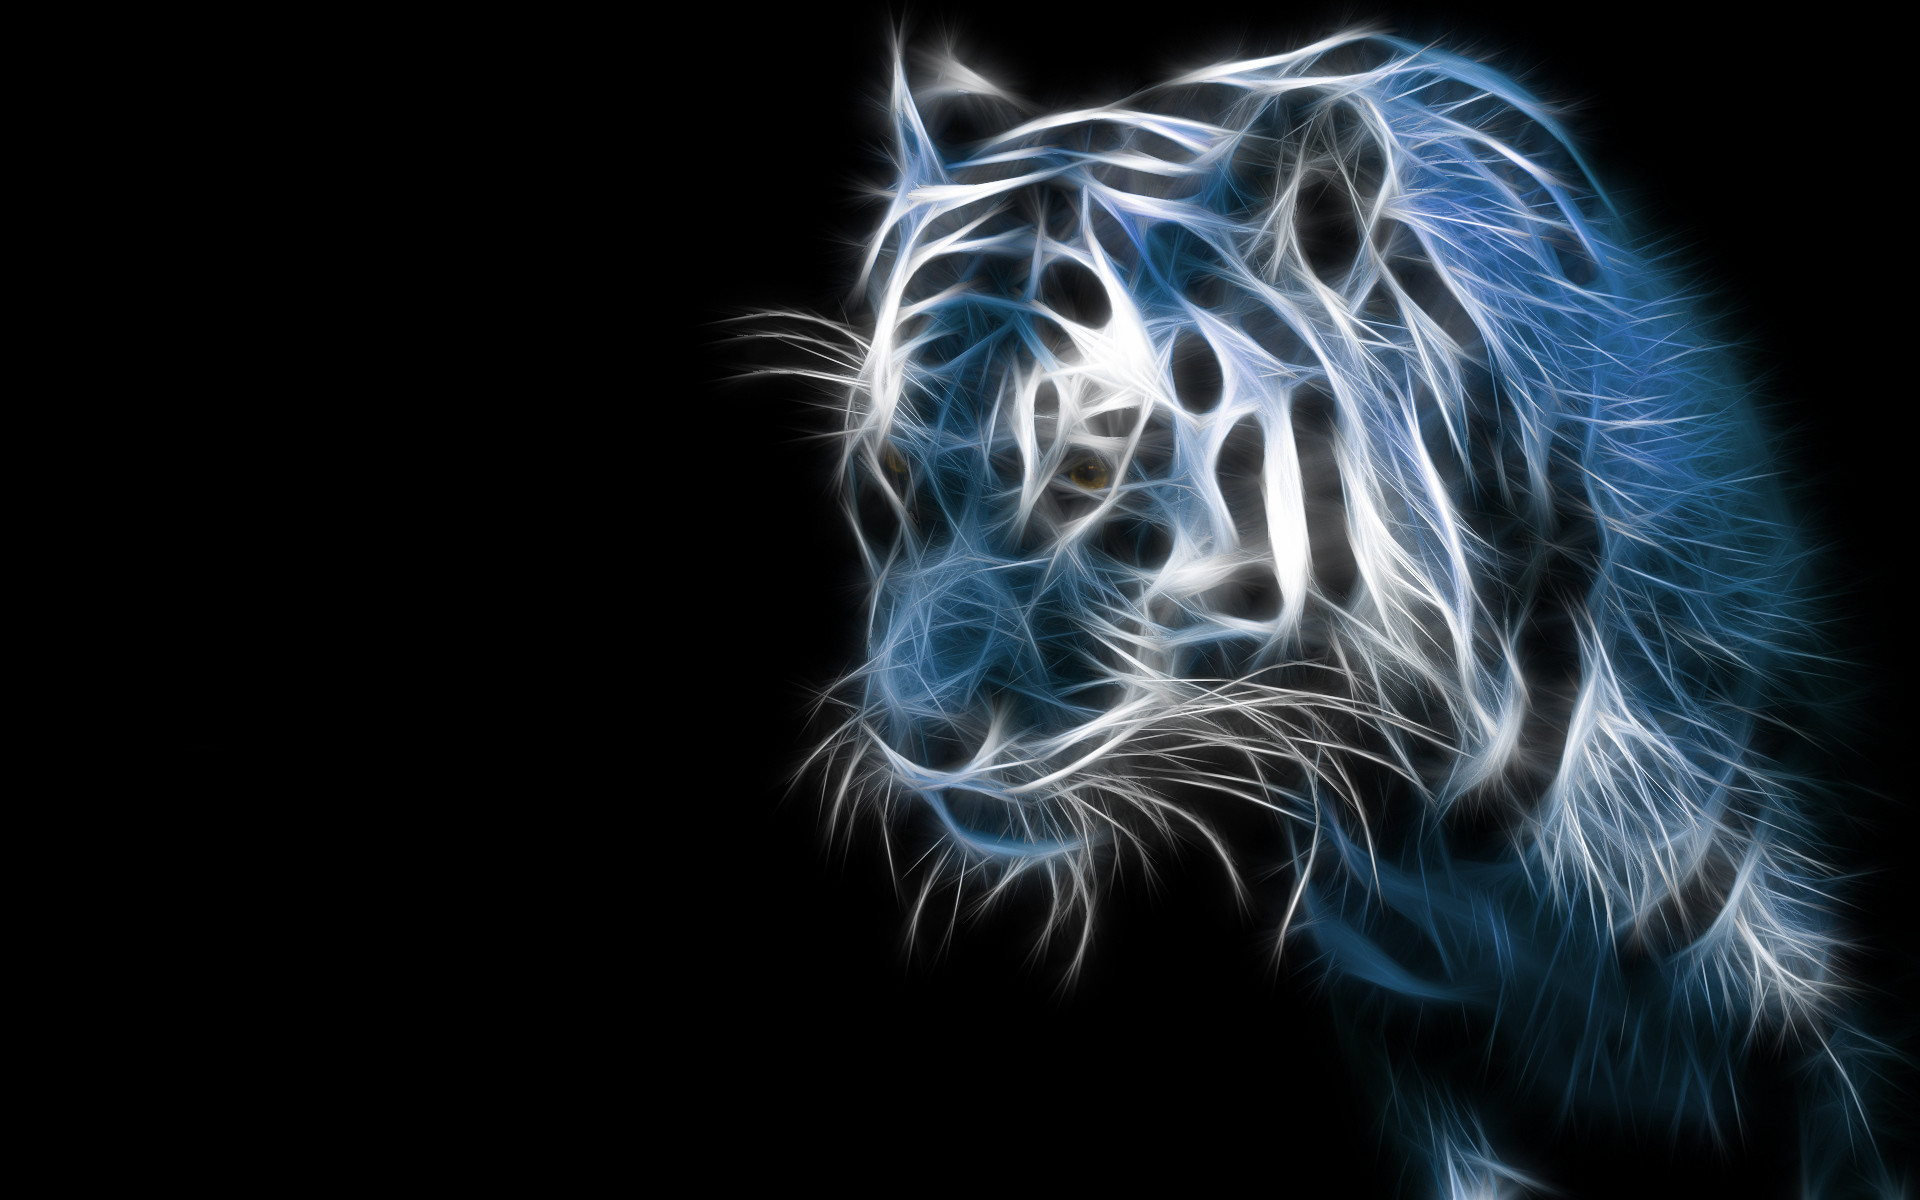 Samsung Galaxy Wallpapers HD – Beautiful black and white tiger wallpaper